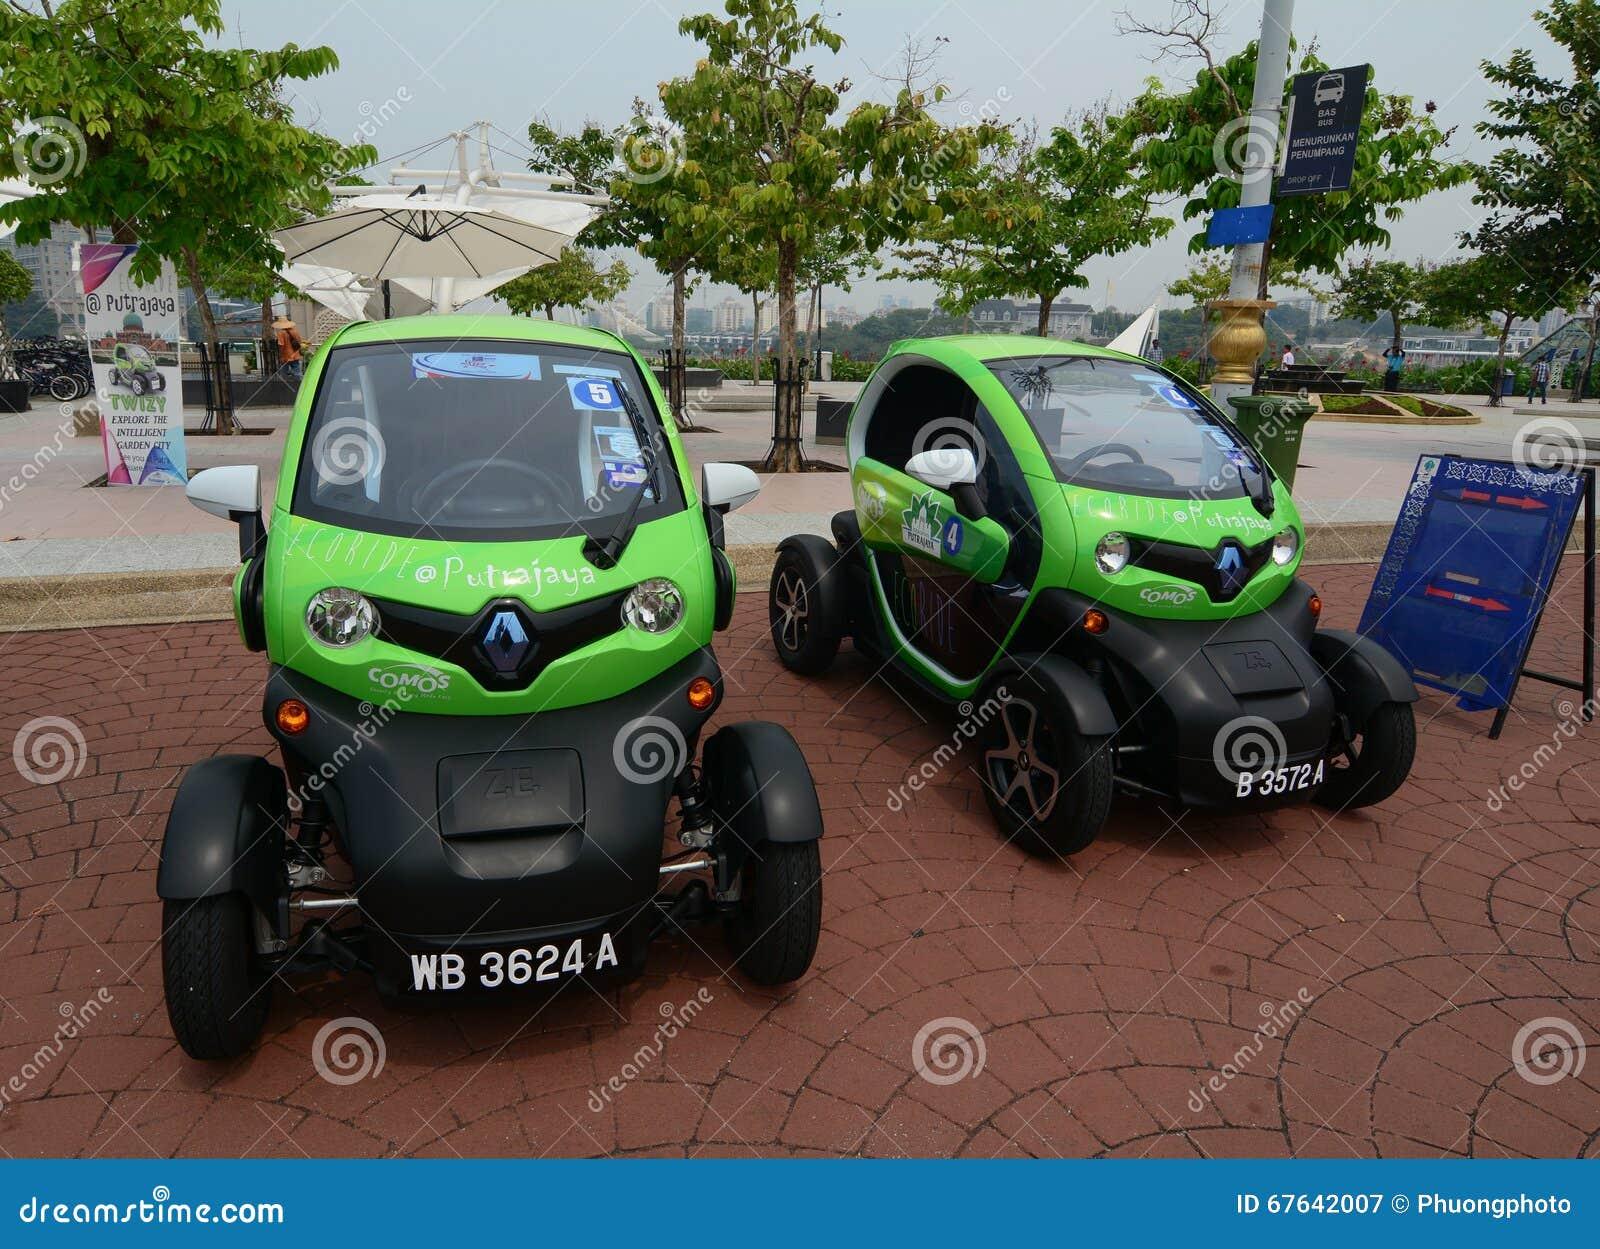 Electric Cars For Tourist In Putrajaya Malaysia Editorial